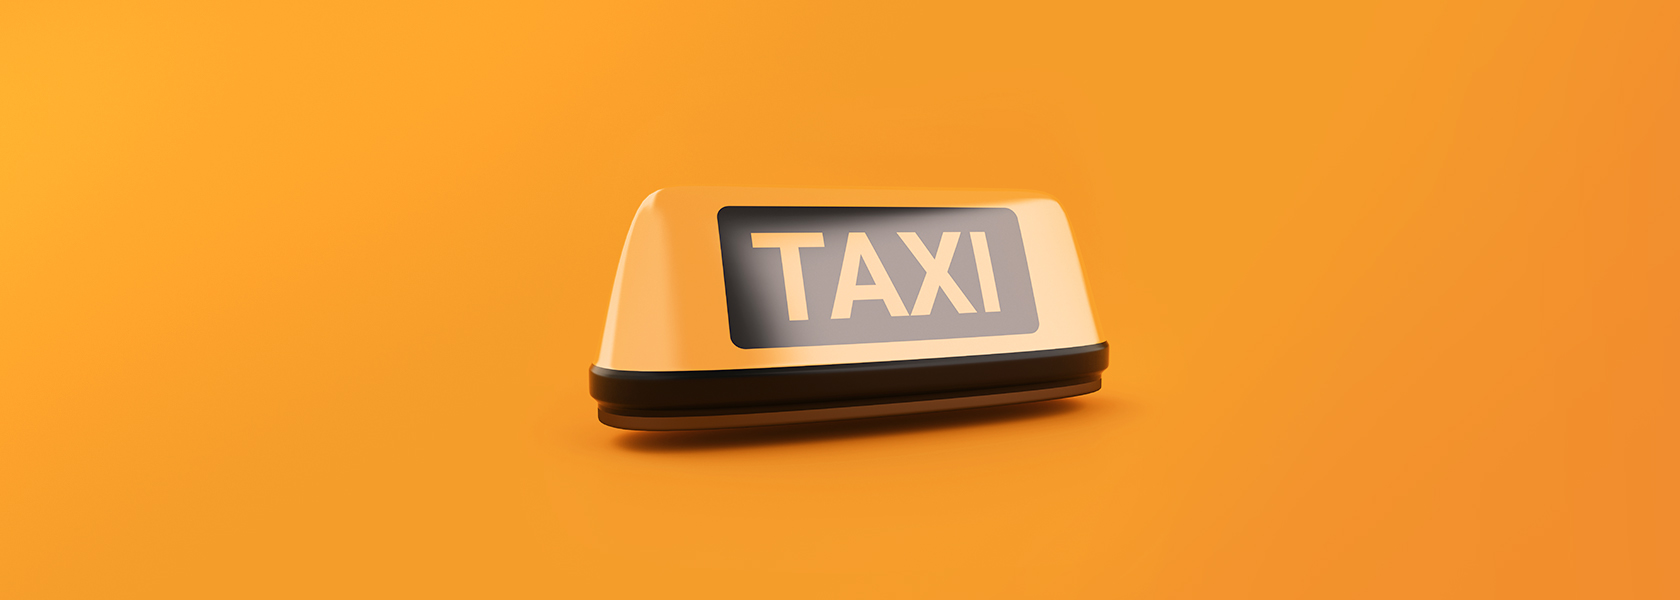 Meteor Taxi дизайн лого